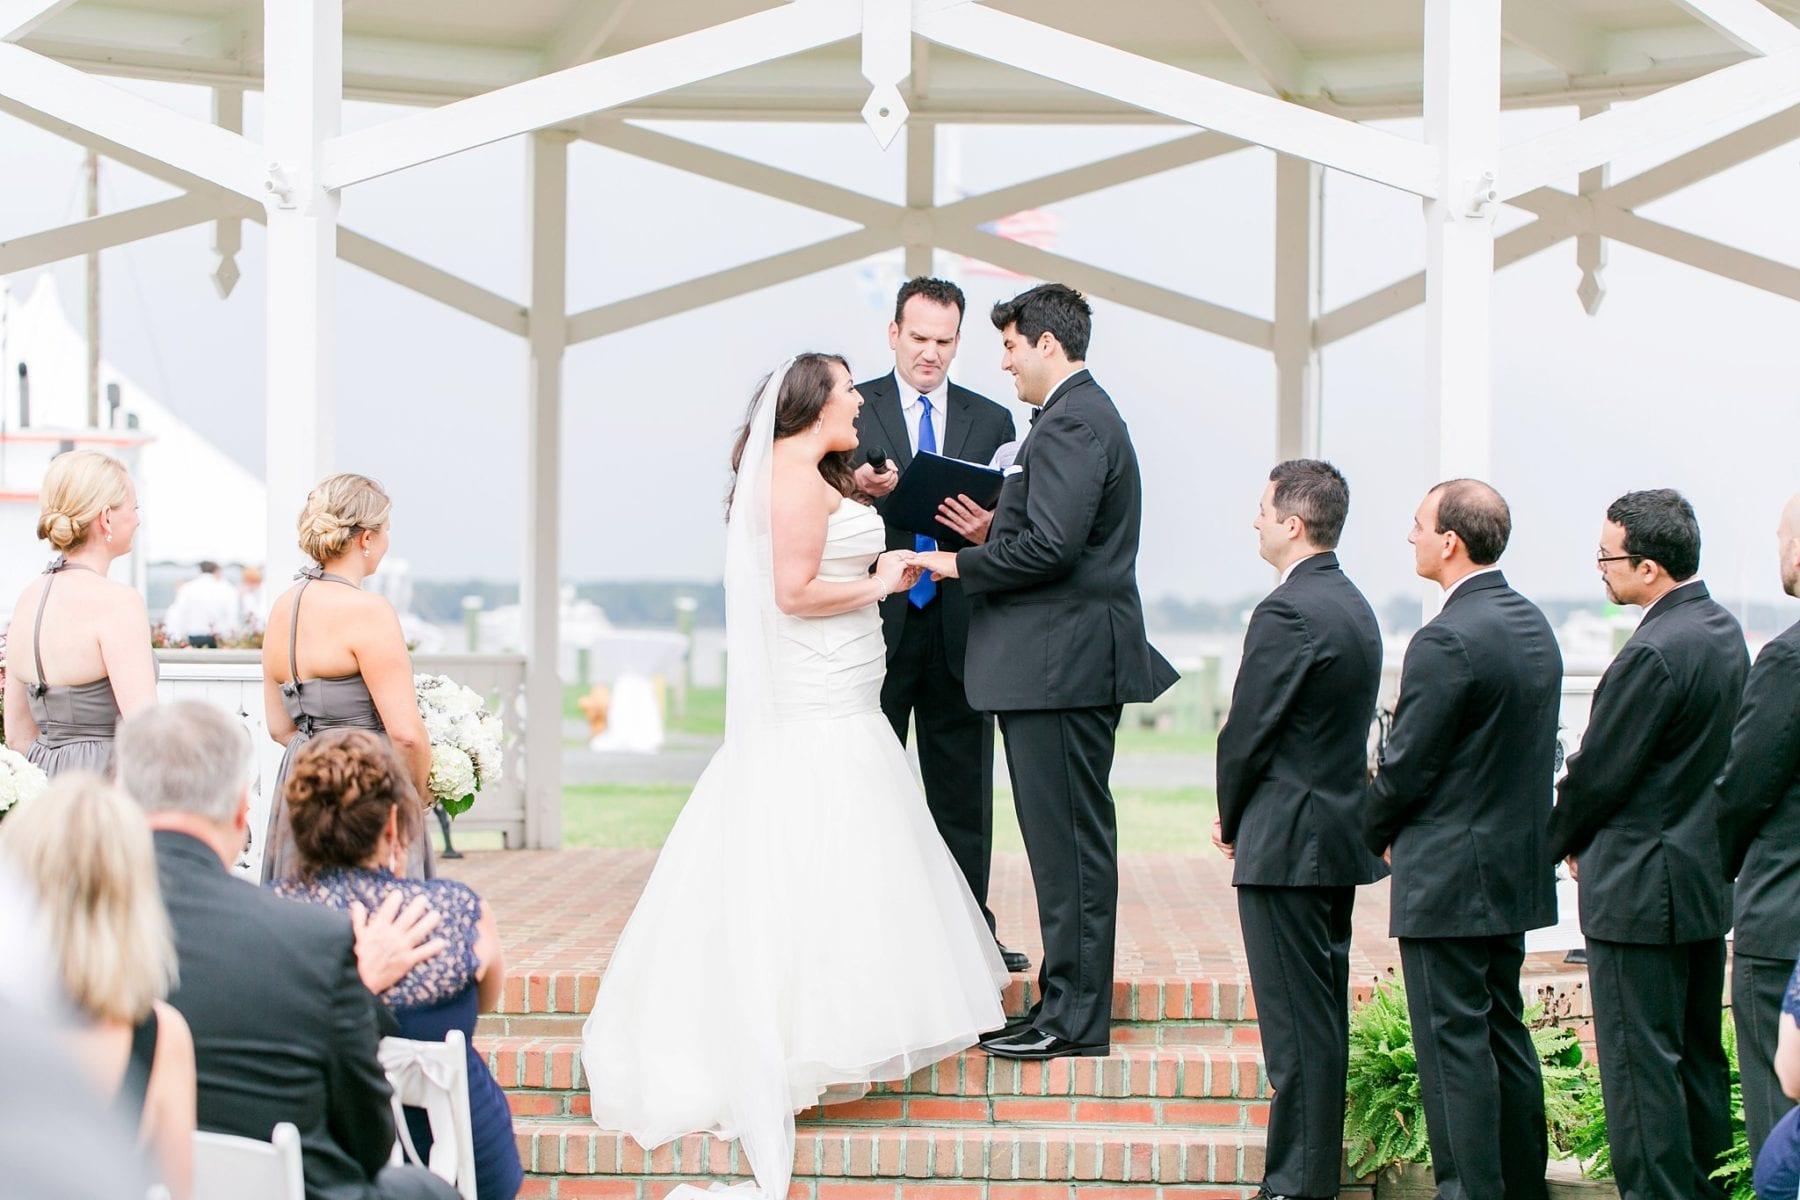 Chesapeake Bay Maritime Museum Wedding Photos Maryland Wedding Photographer Megan Kelsey Photography Halie & Mike-114.jpg